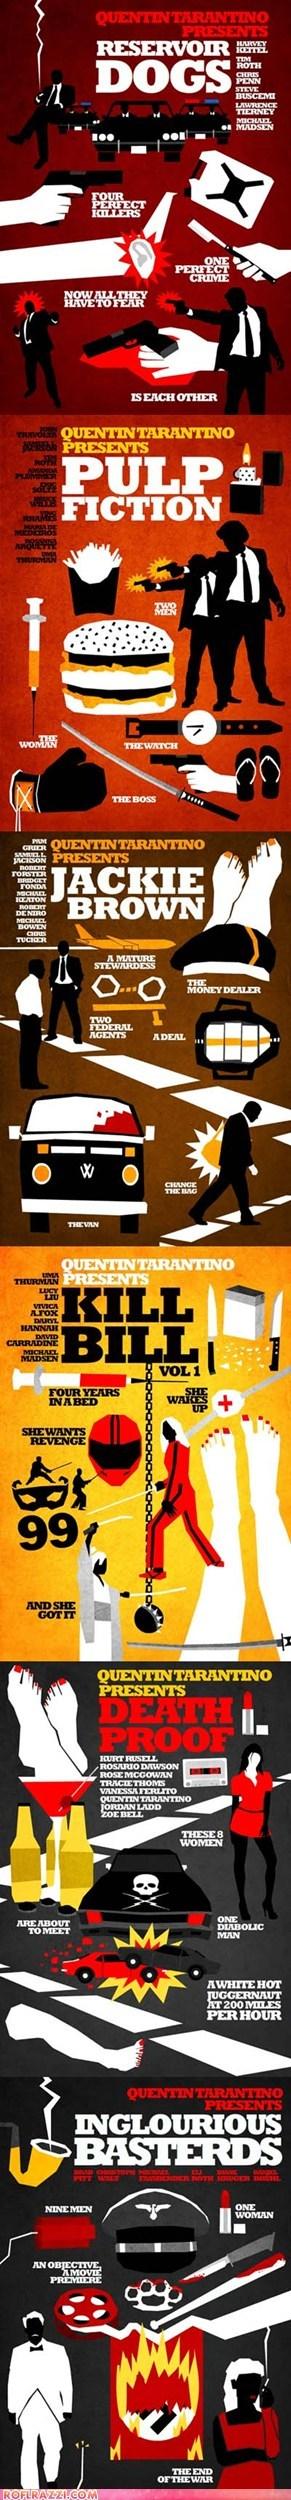 art,celeb,cool,director,Kill Bill,Movie,posters,pulp fiction,quentin tarantino